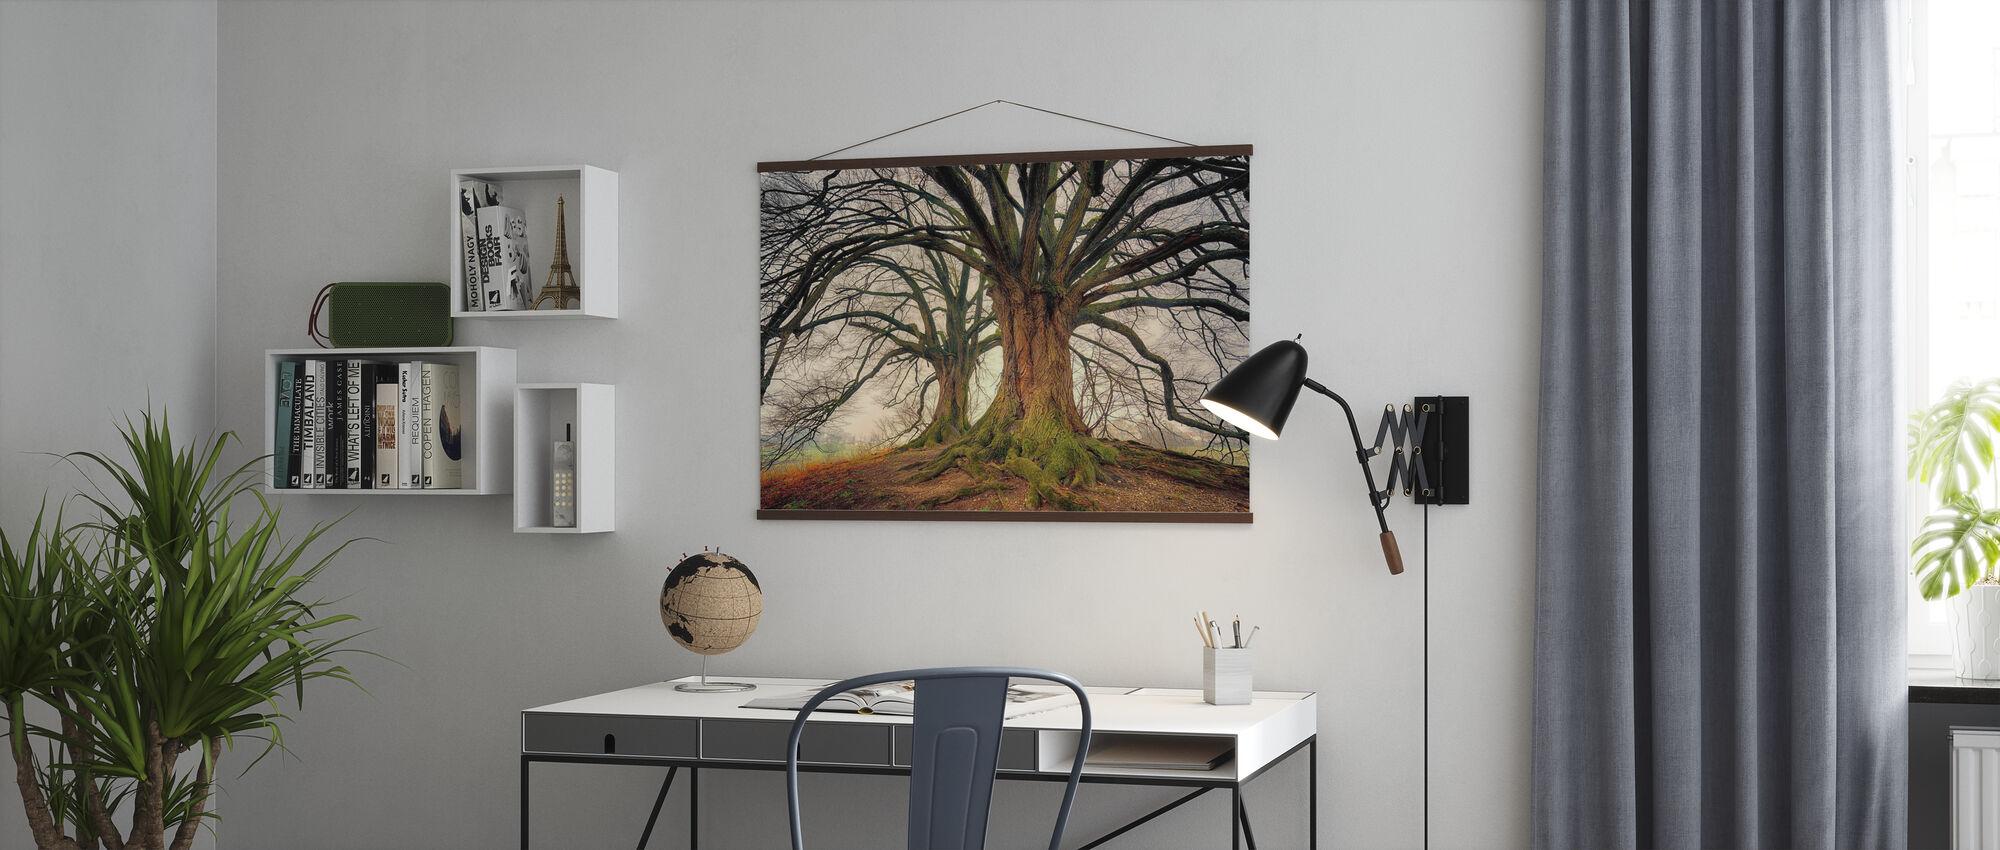 Big Kahl Baum - Poster - Büro